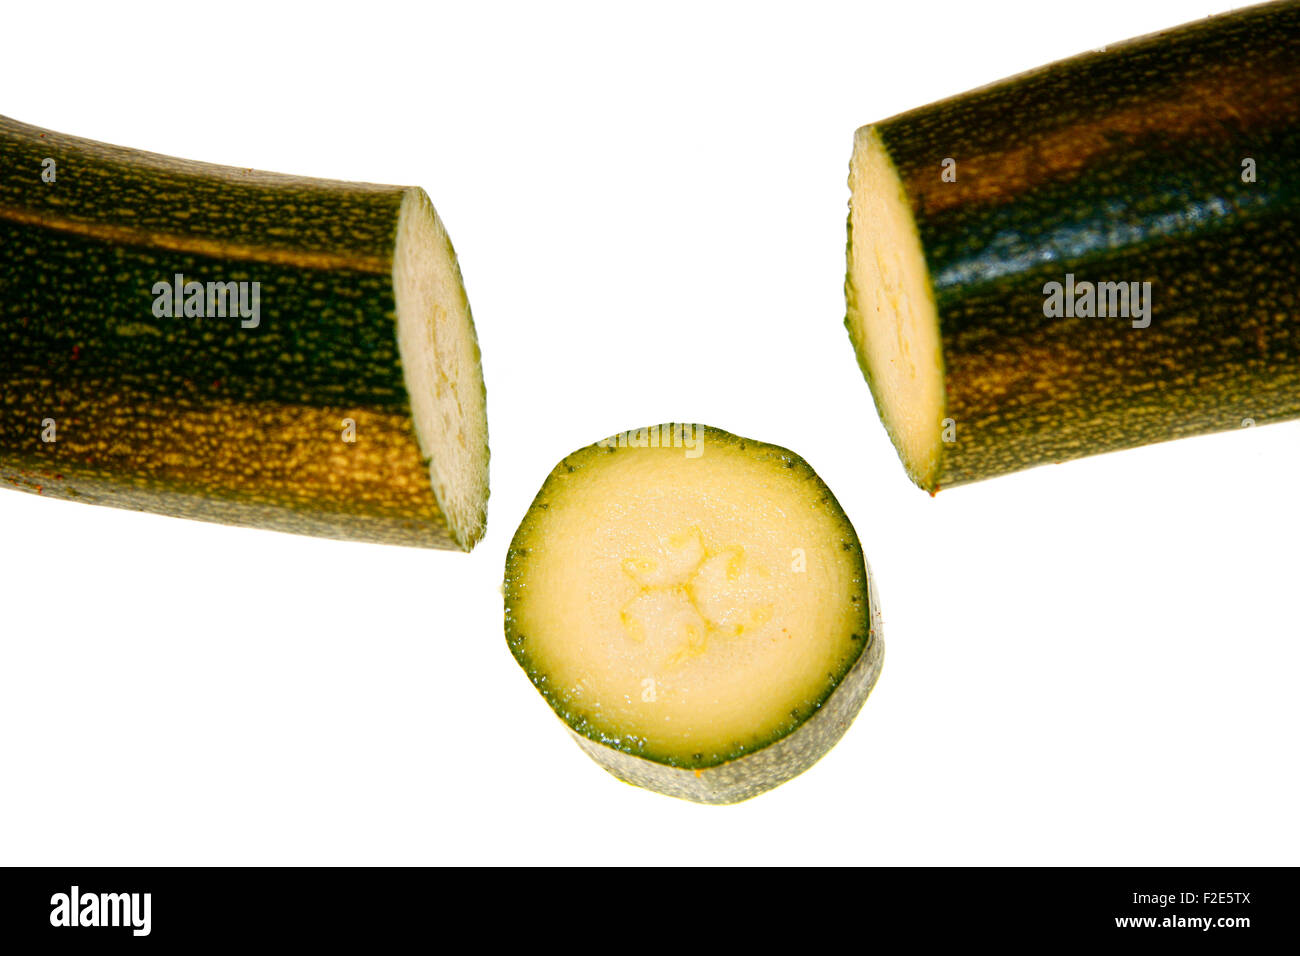 Zucchini / Zucchetti / courgette - Symbolbild Nahrungsmittel . Stock Photo